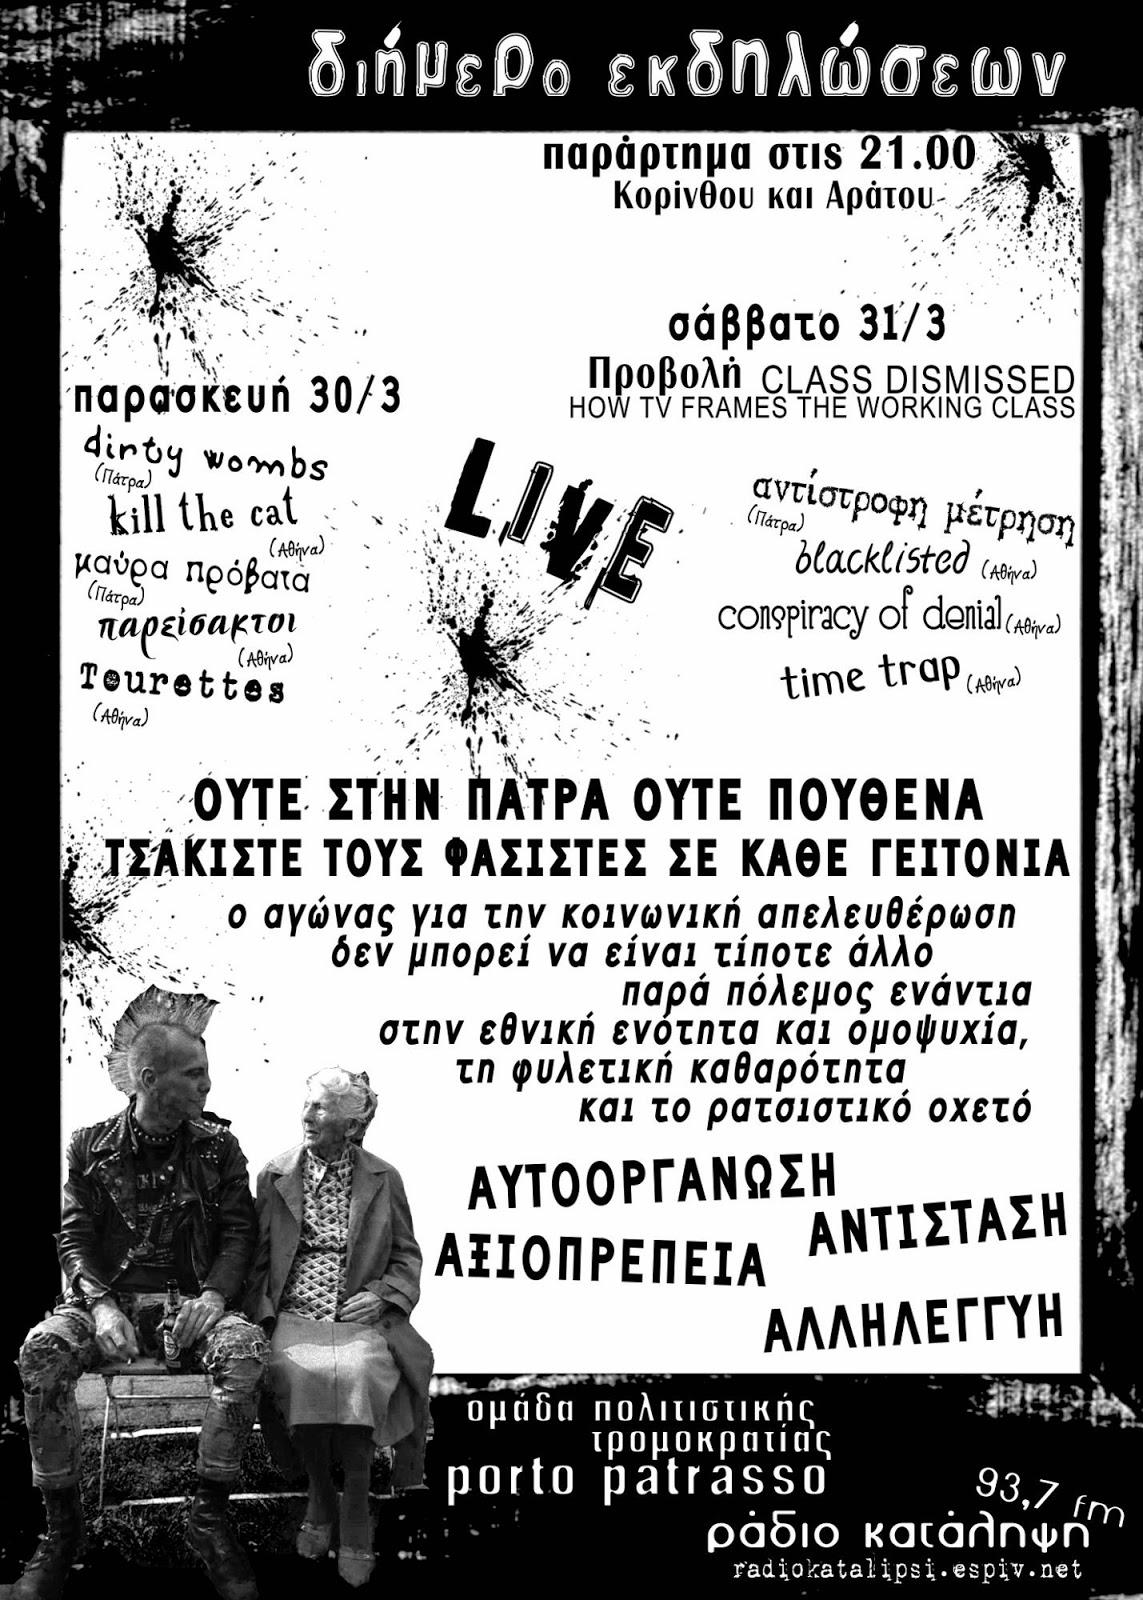 http://antistrofimetrisi.blogspot.gr/2012/09/30-3132012-2.html